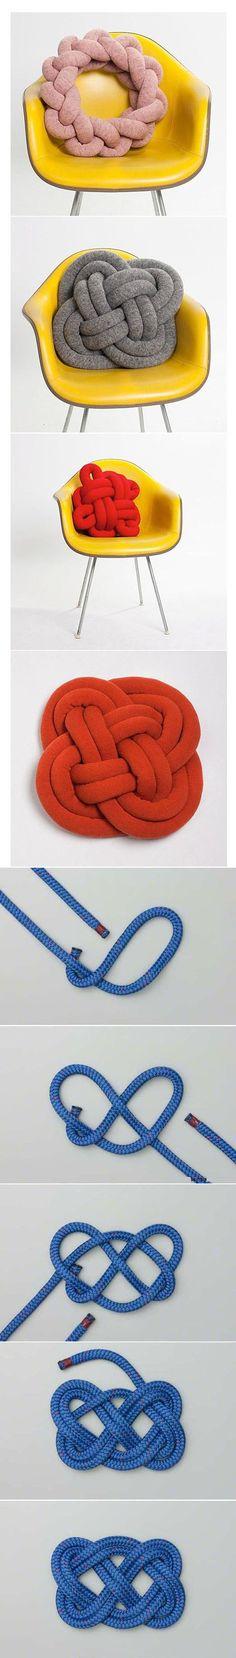 Beautiful Rope Crafts | DIY & Crafts Tutorials